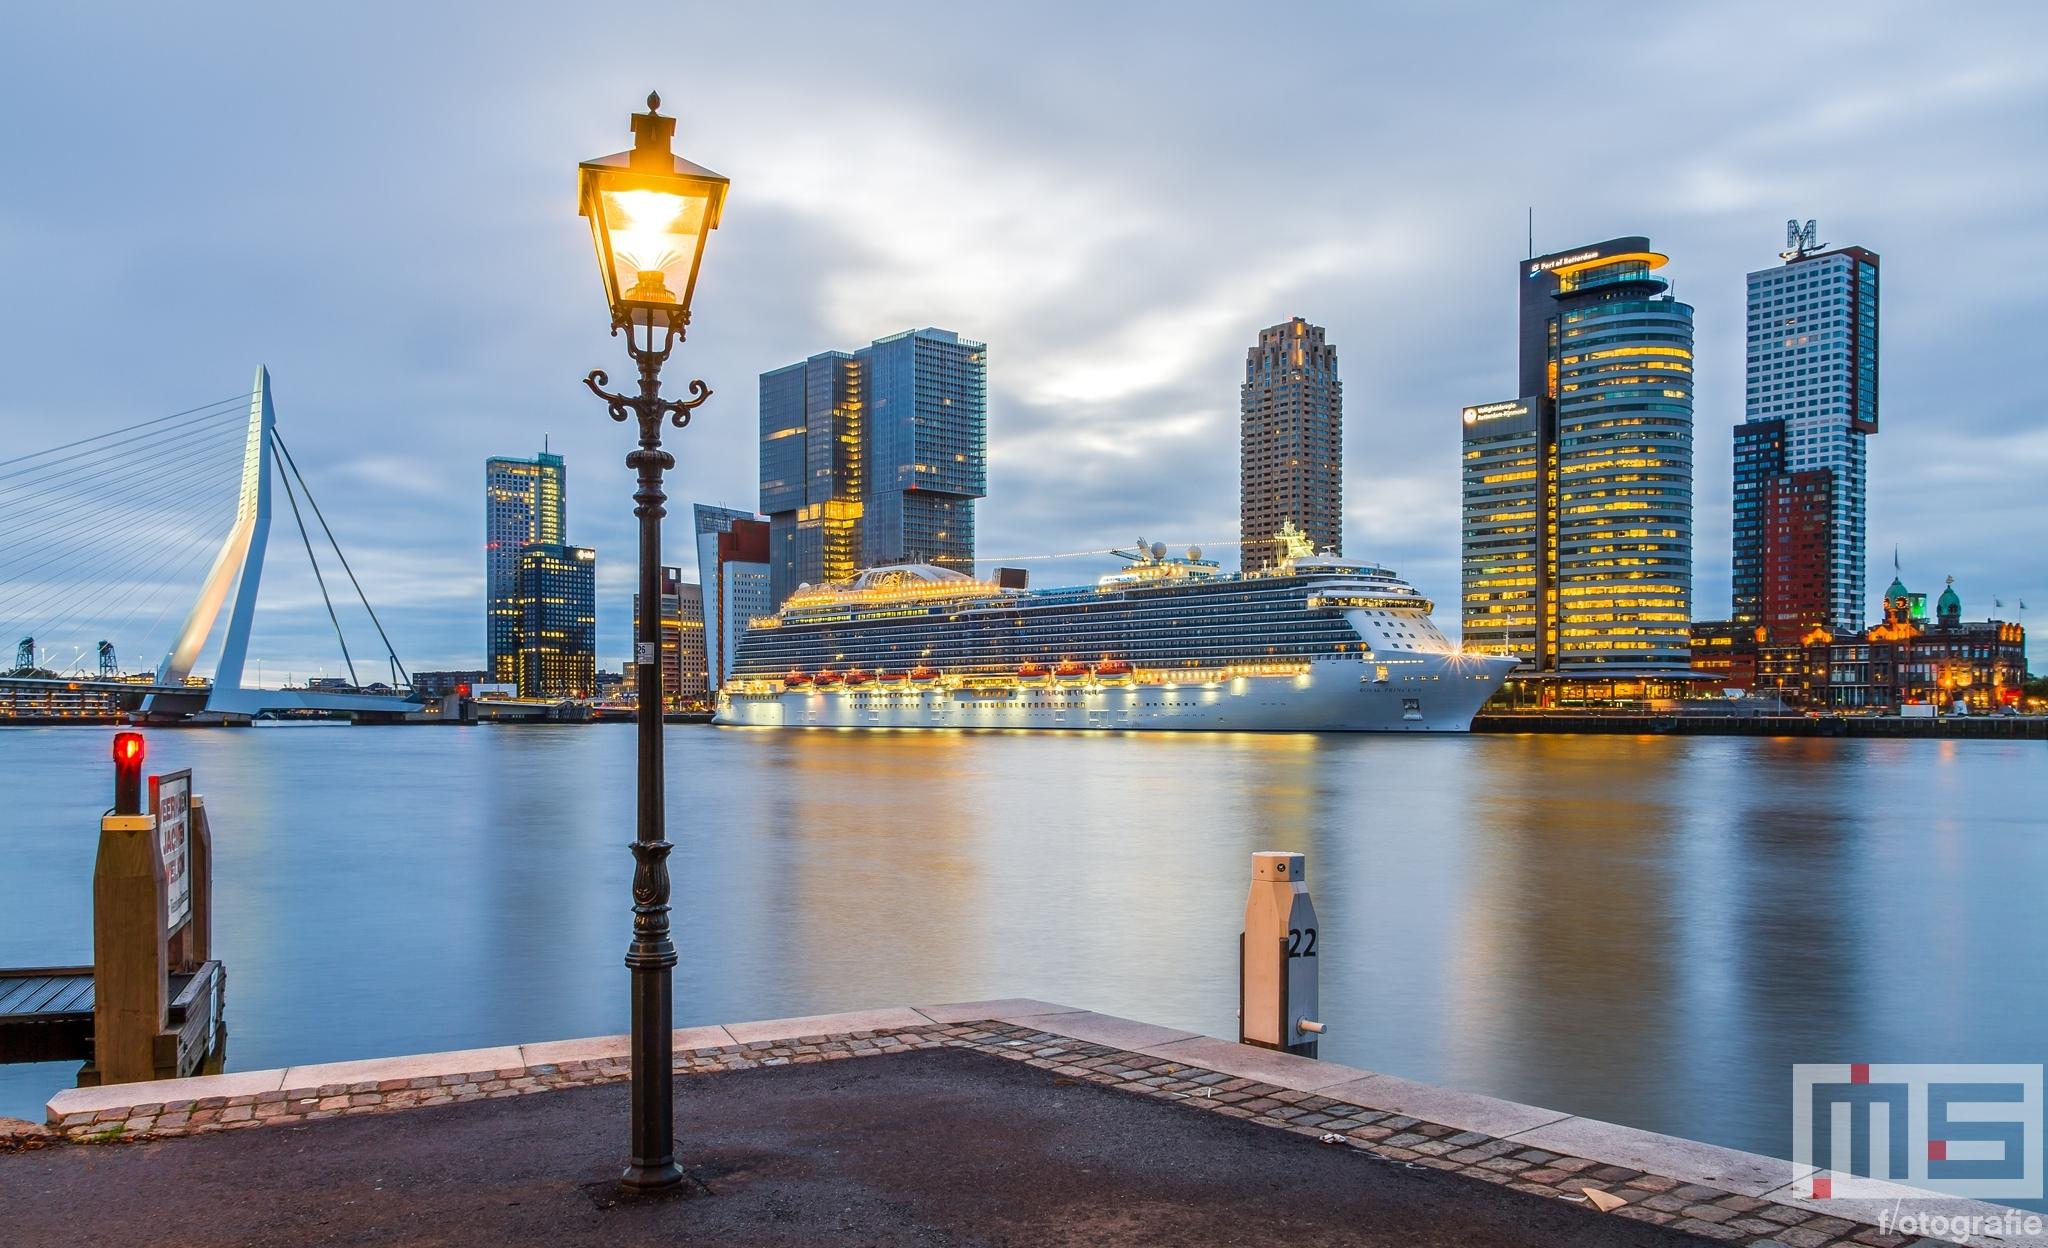 Te Koop | Het cruiseschip Royal Princess aan de Cruise Terminal in Rotterdam